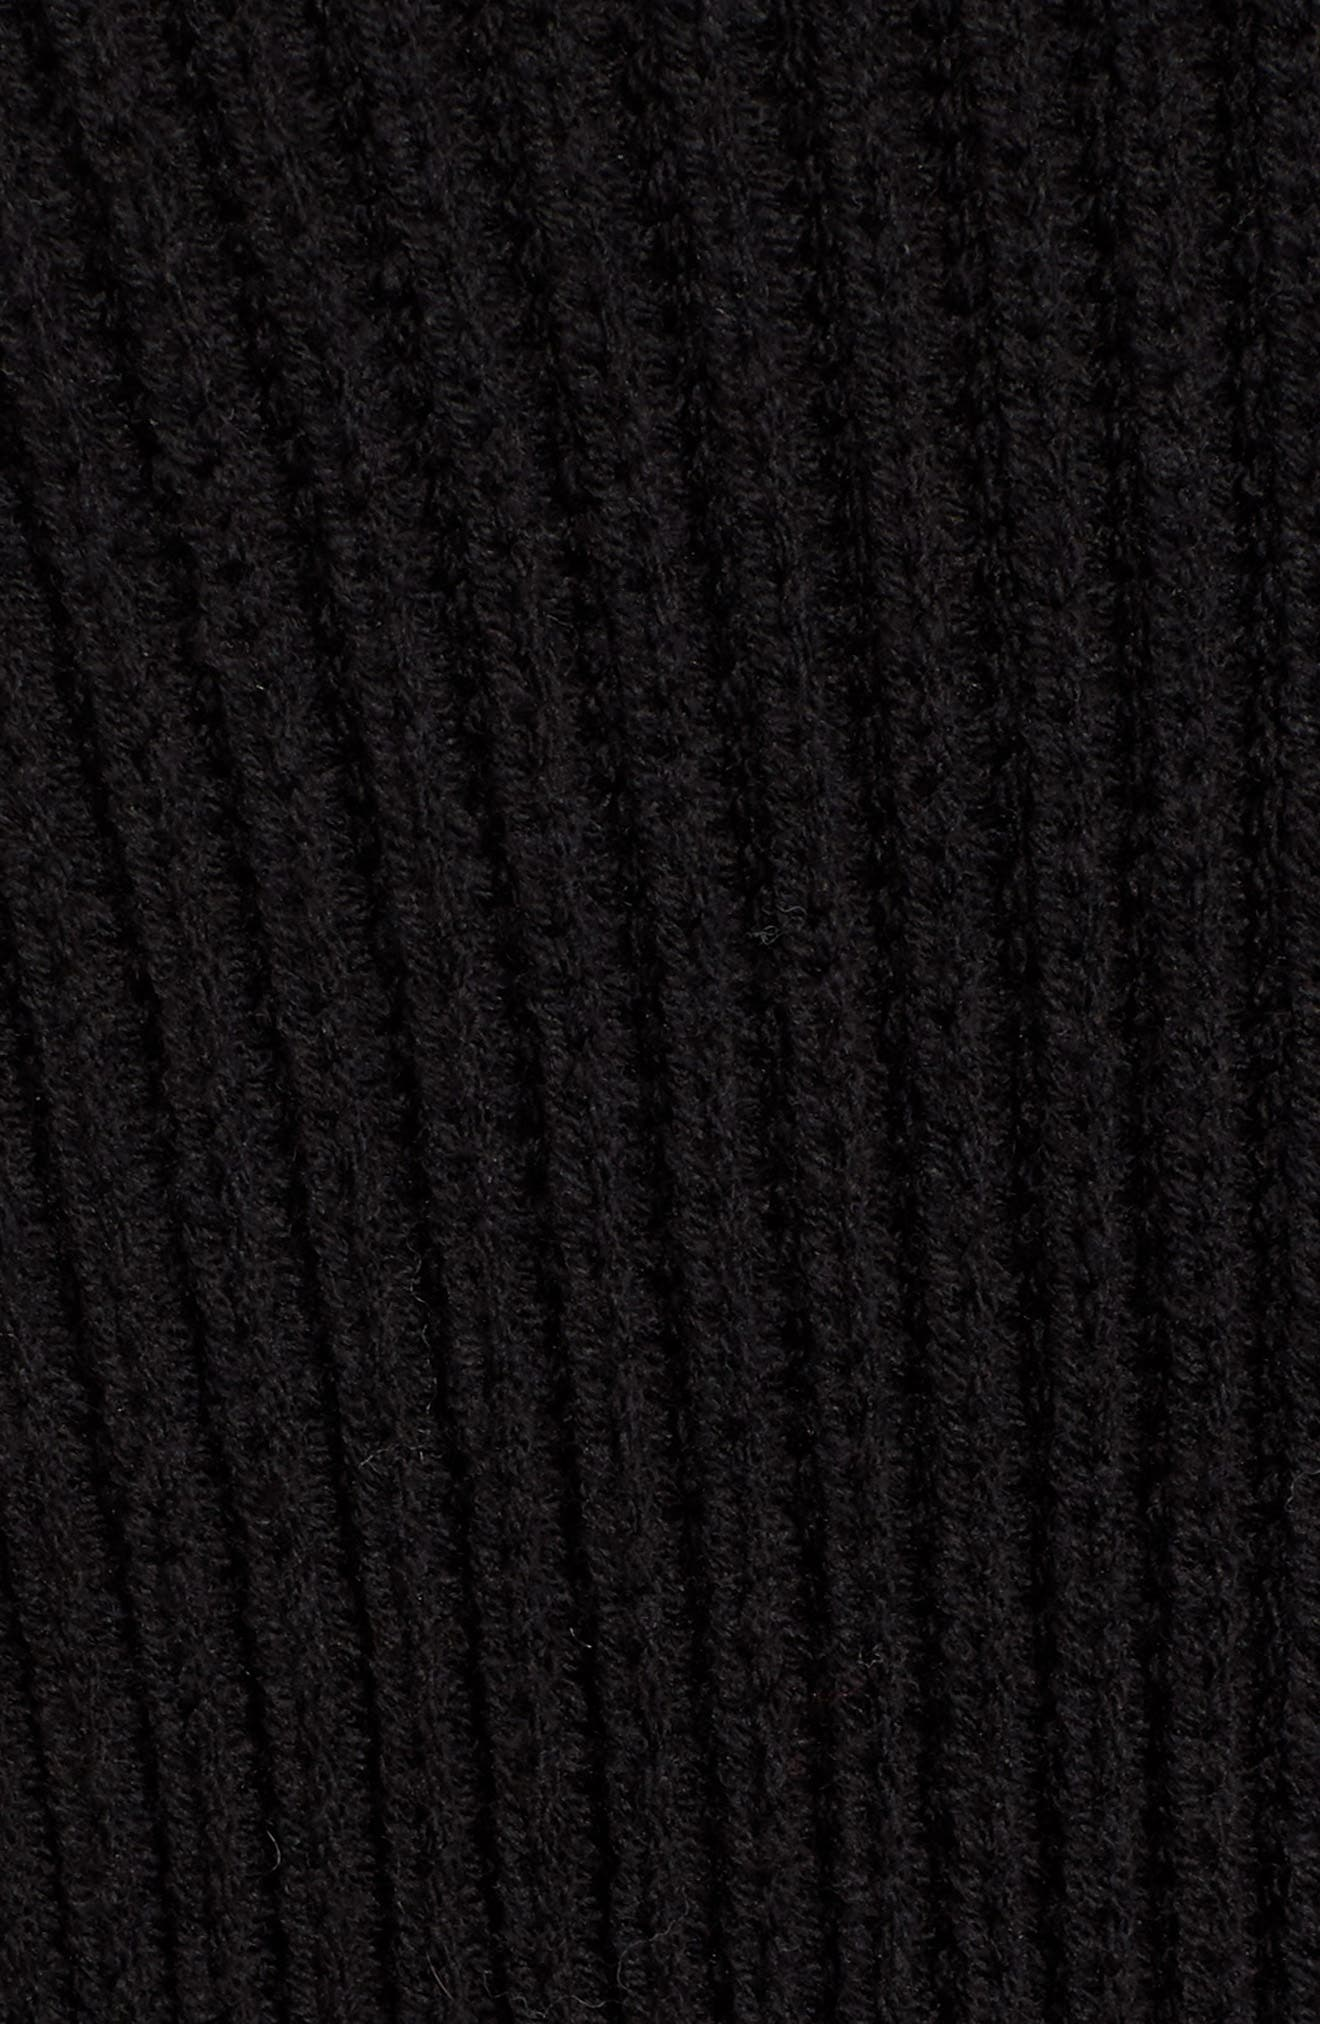 Rib Overlap Cardigan,                             Alternate thumbnail 5, color,                             001